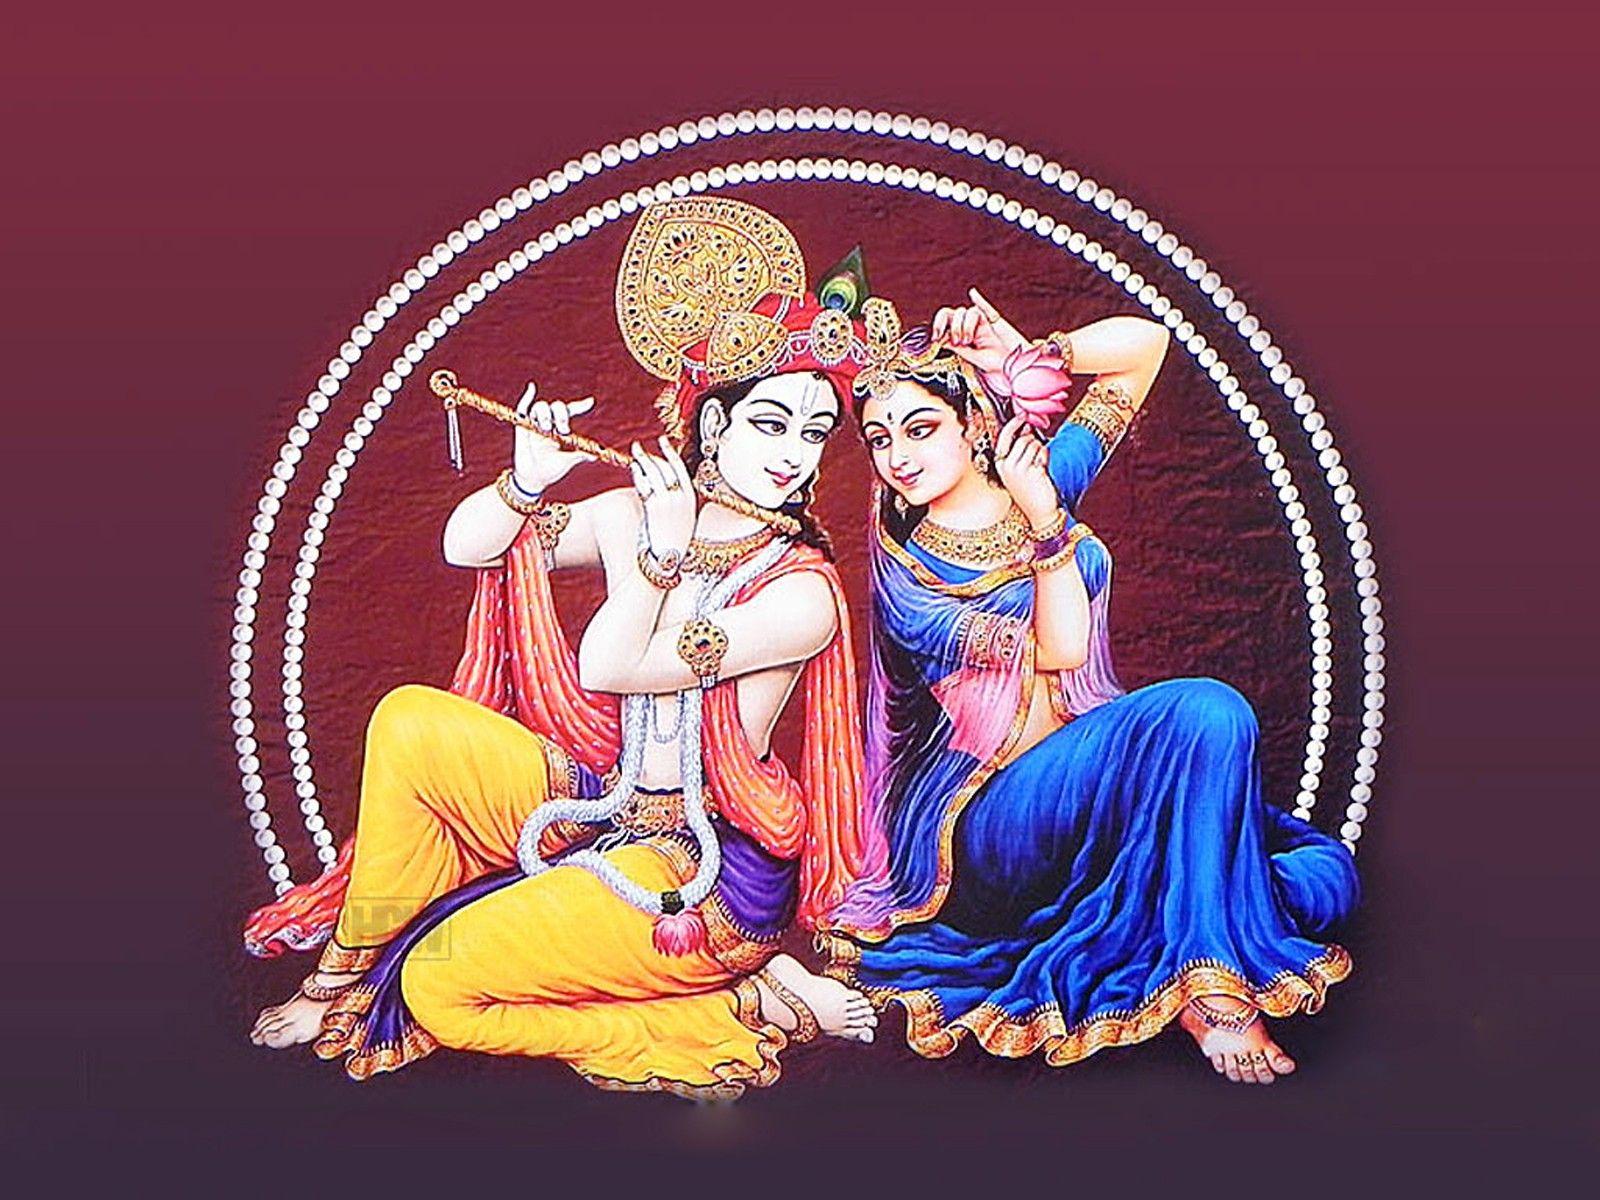 Bhagwan Krishna With Radha Hd Wallpaper Free 1080p Krishna Wallpaper Radha Krishna Wallpaper Krishna Images